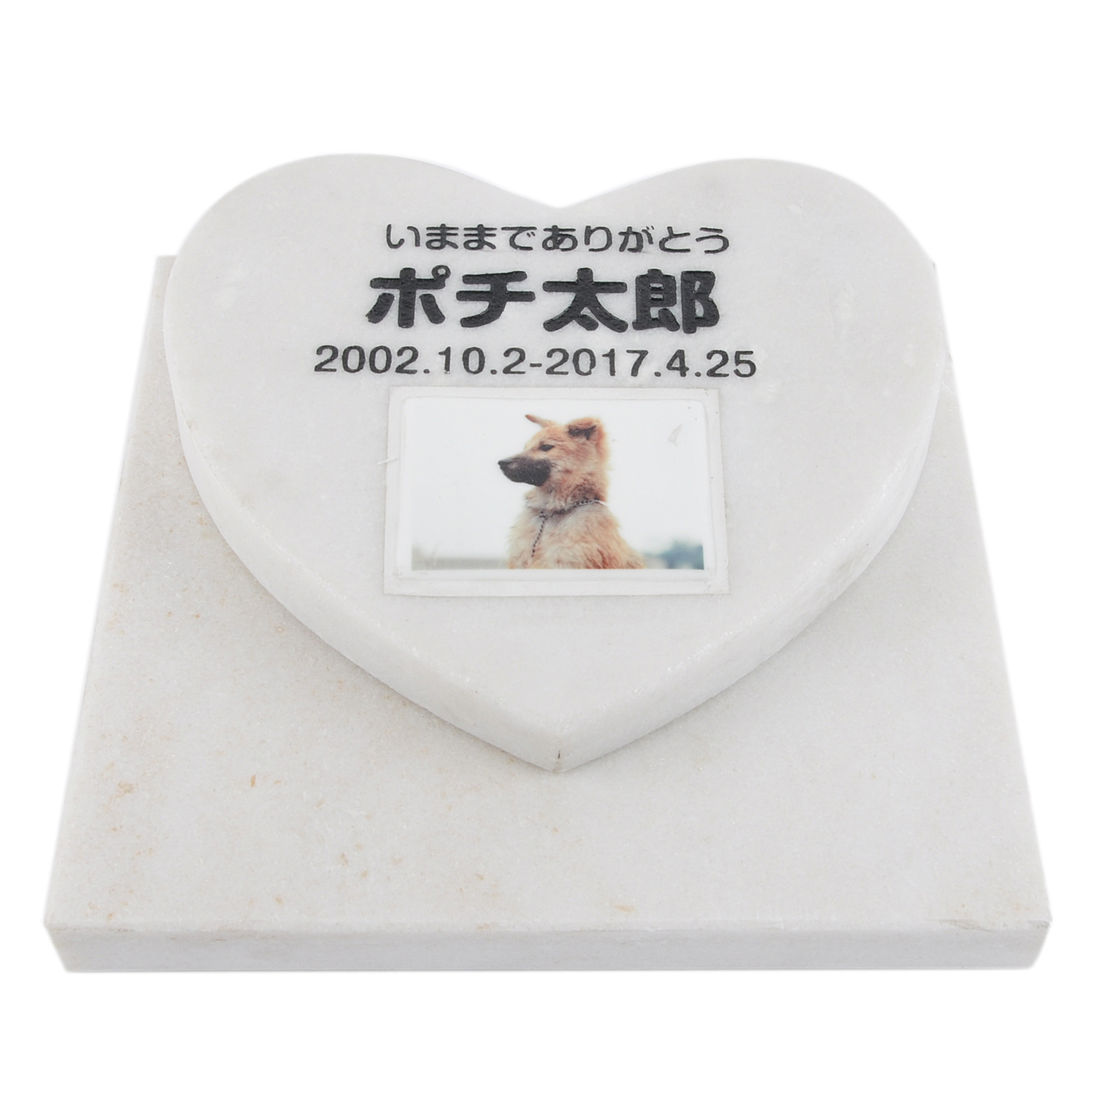 Pet&Love. ペットのお墓 天然石製 セット型 遺影付きタイプ 御影石 ホワイト ハート(お客様の写真を印刷)  【HLS_DU】【楽ギフ_名入れ】 attr169attr ctgr2ctgr sml3sml+ctgr2ctgr noanml